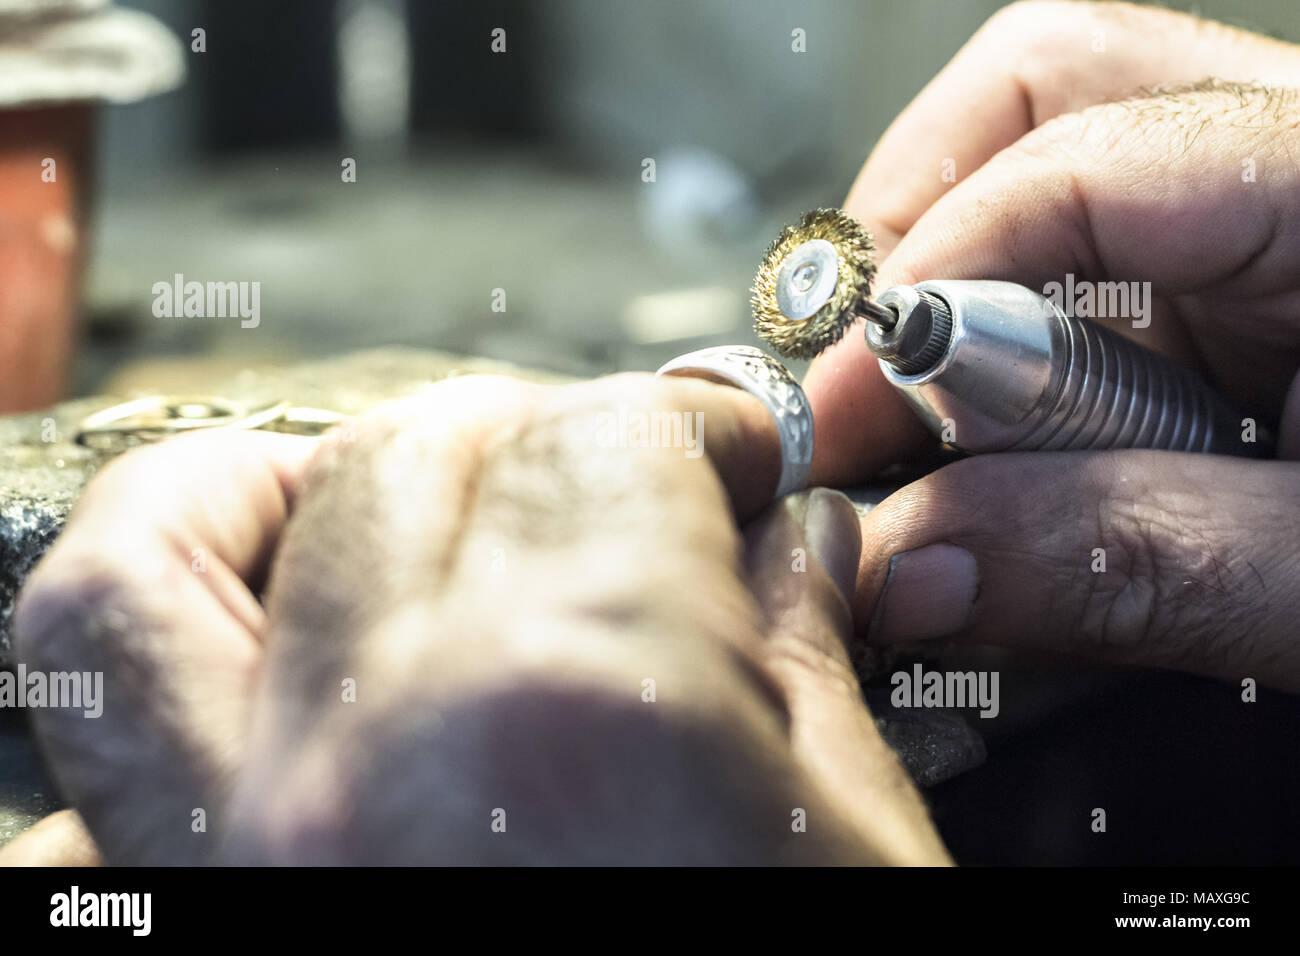 Ring Wire Stockfotos & Ring Wire Bilder - Alamy